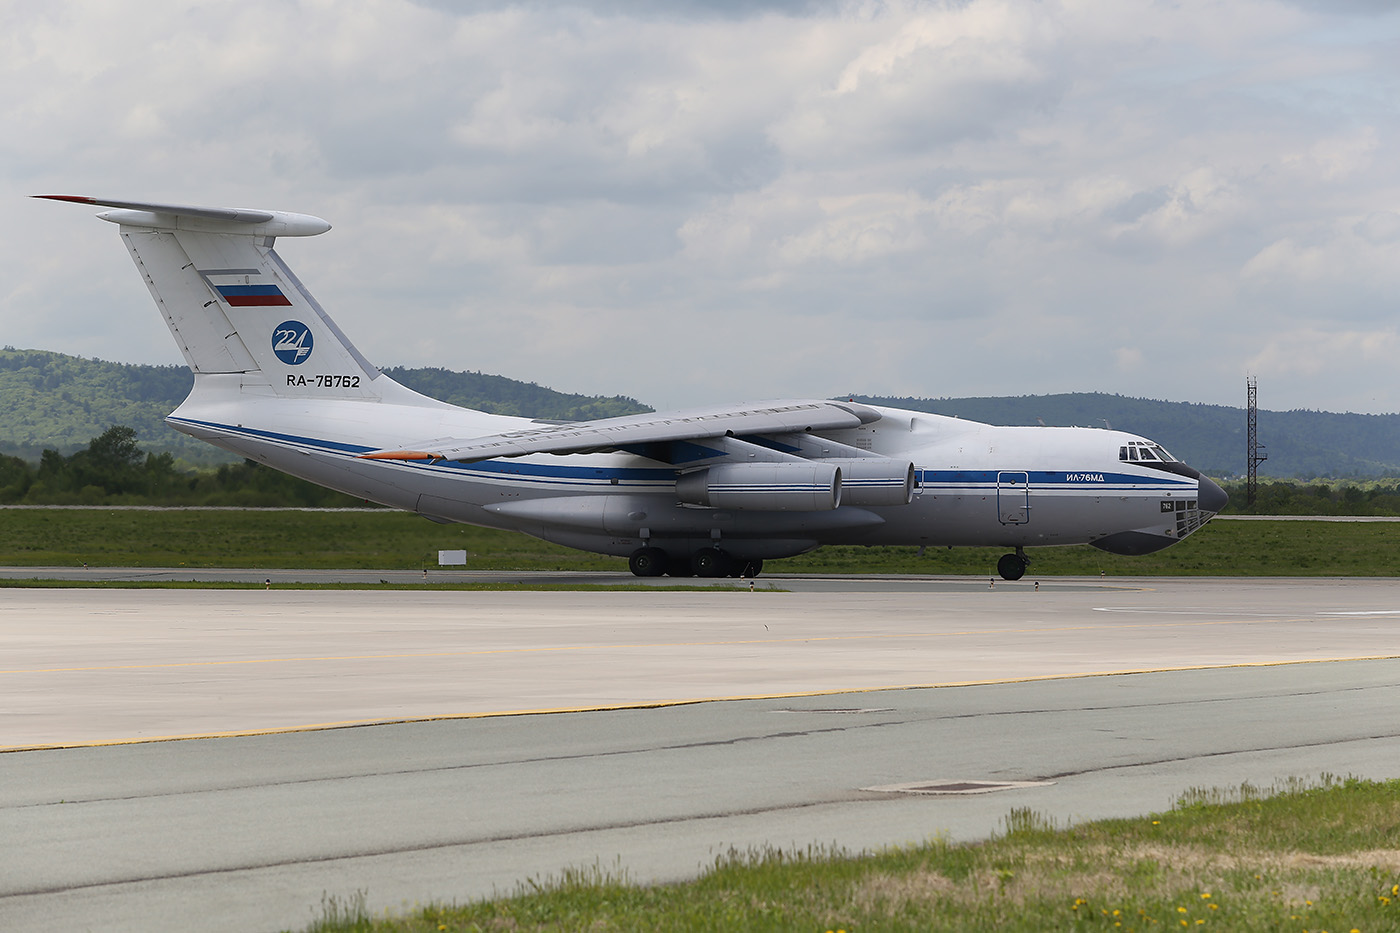 ra-78762